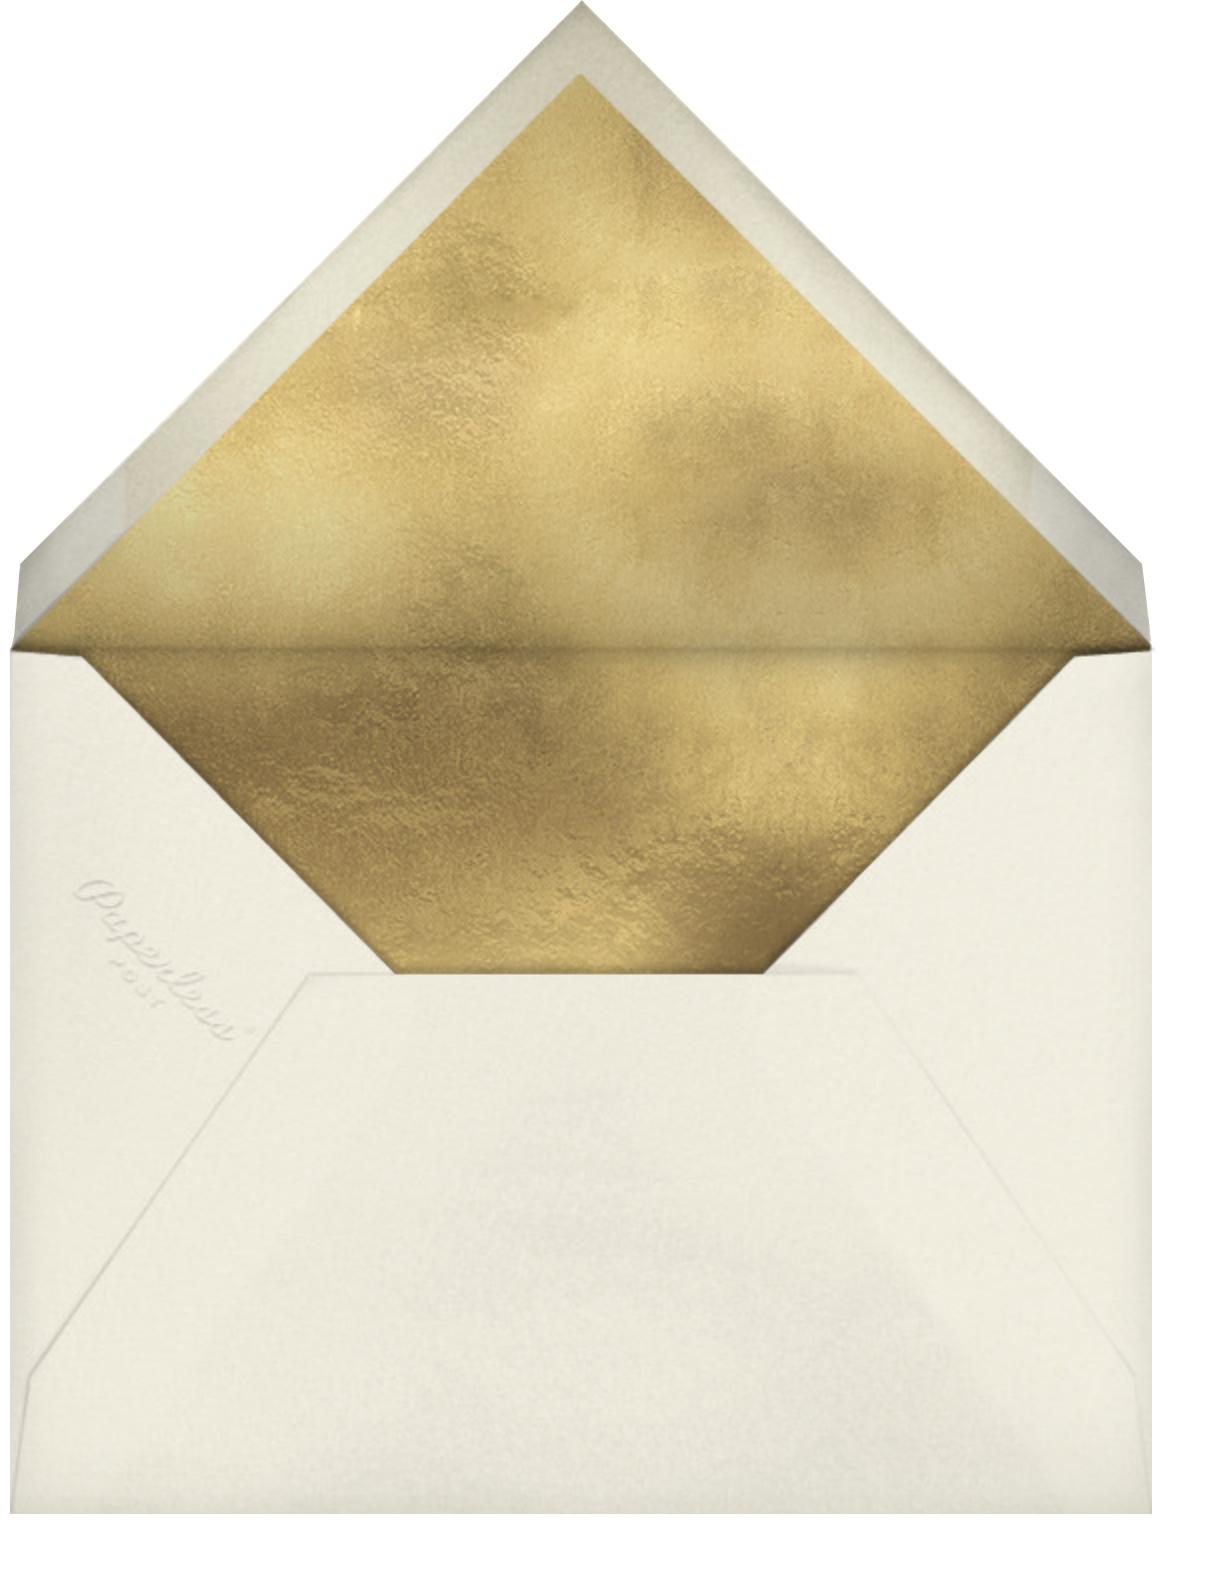 Climbing Hearts - Meringue - kate spade new york - Bridal shower - envelope back